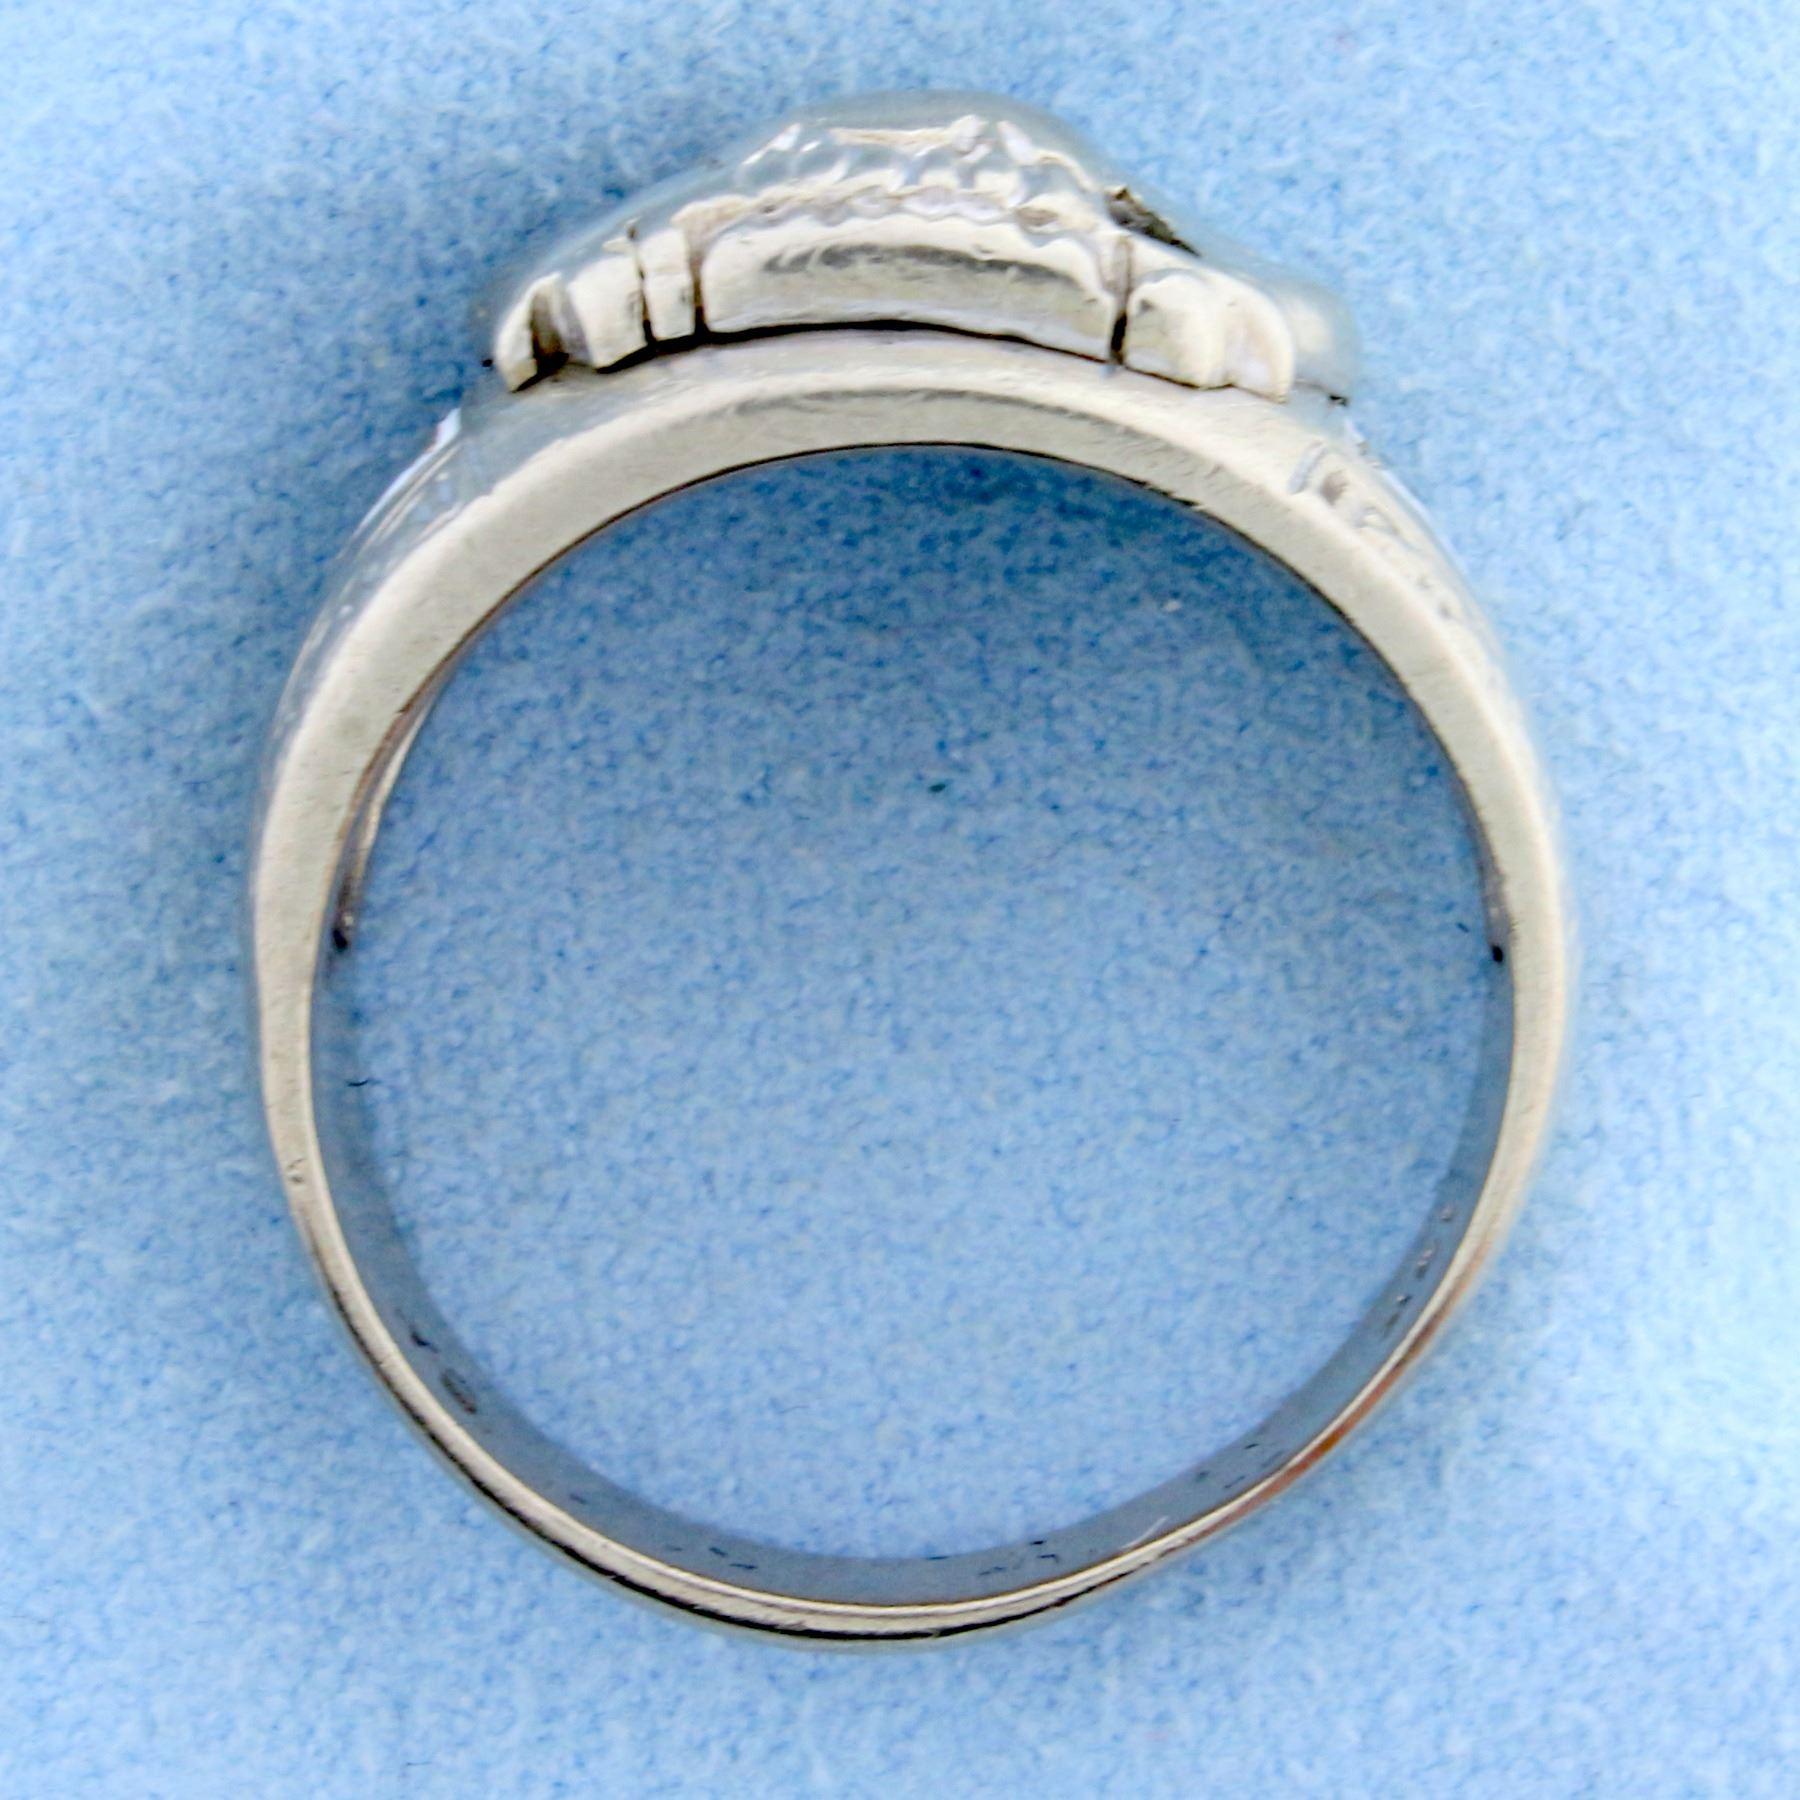 Antique 32 Degree Masonic Ring in 10k White Gold